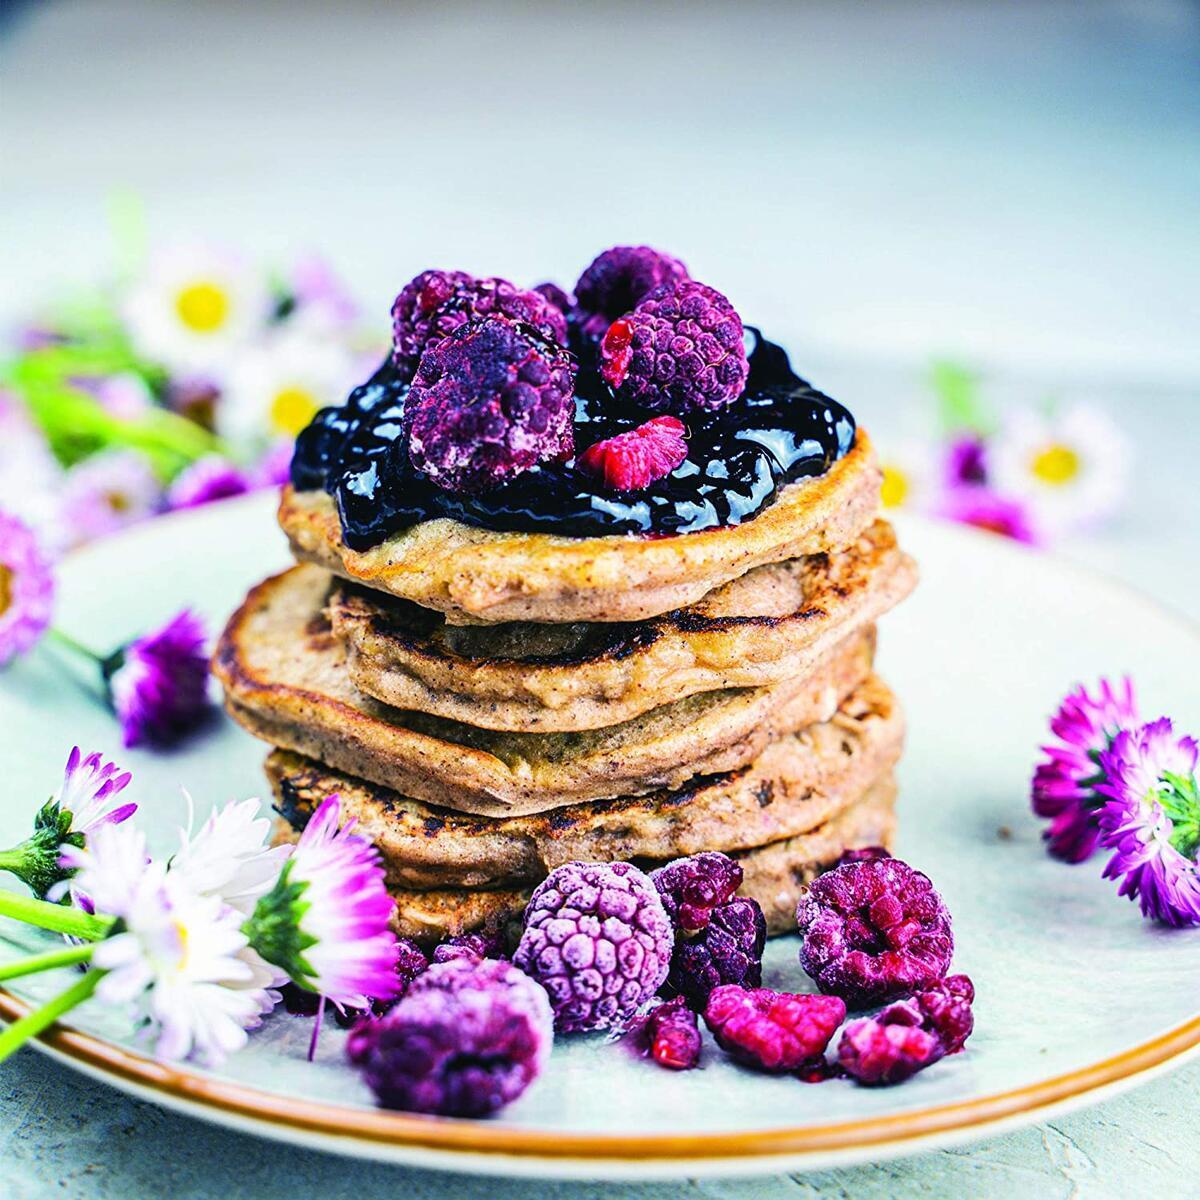 Jungle Powders Raw Buckwheat Flour Gluten Free 1lb Light Vegan Cooking Powder…